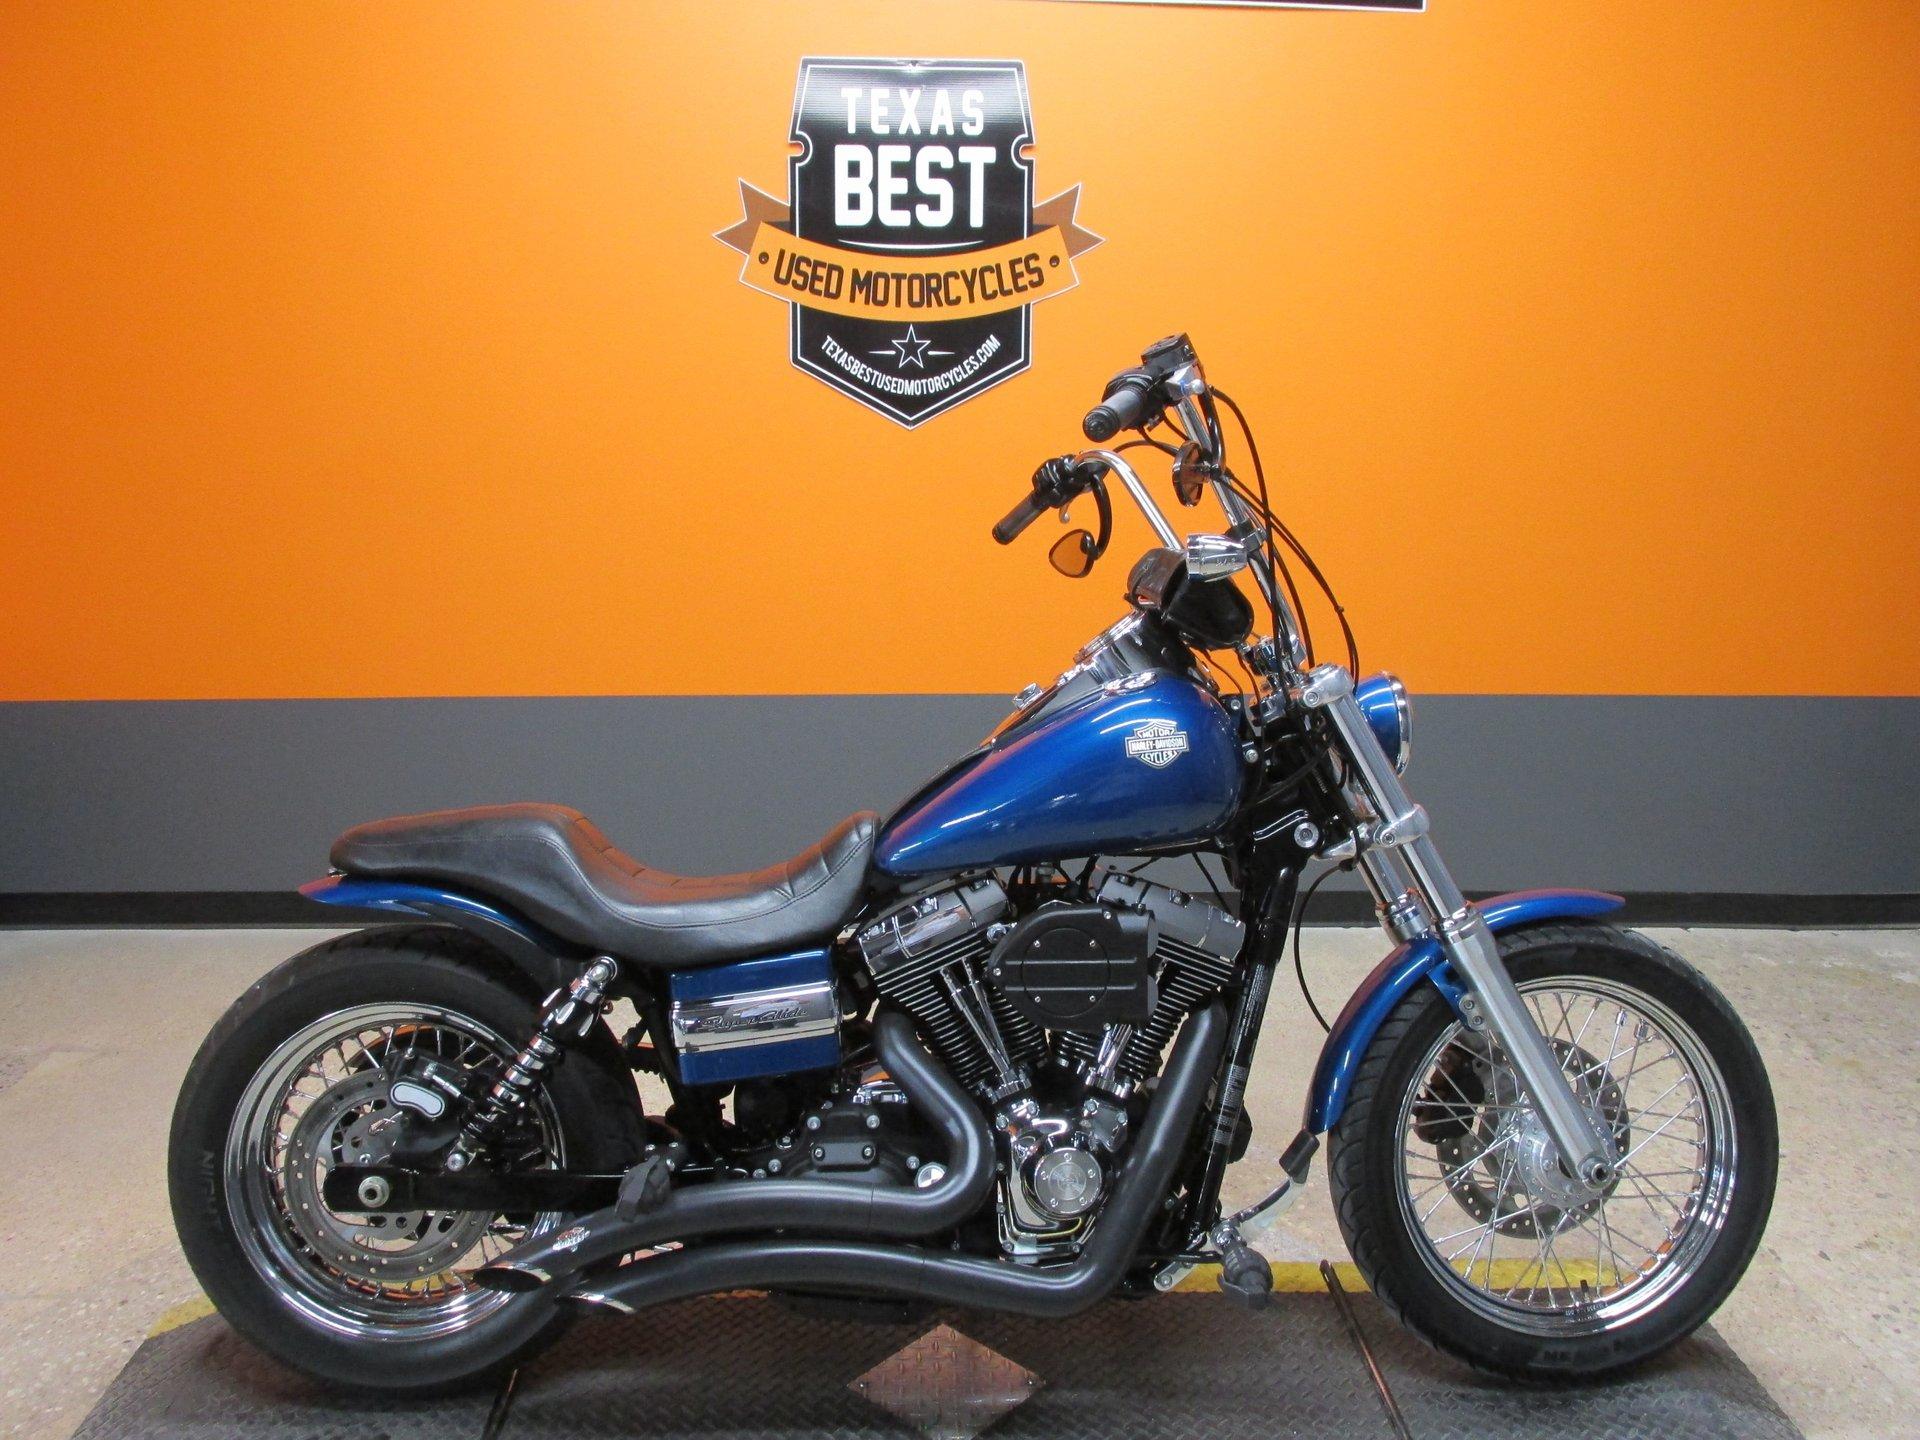 2011 Harley-Davidson Dyna Super Glide | American